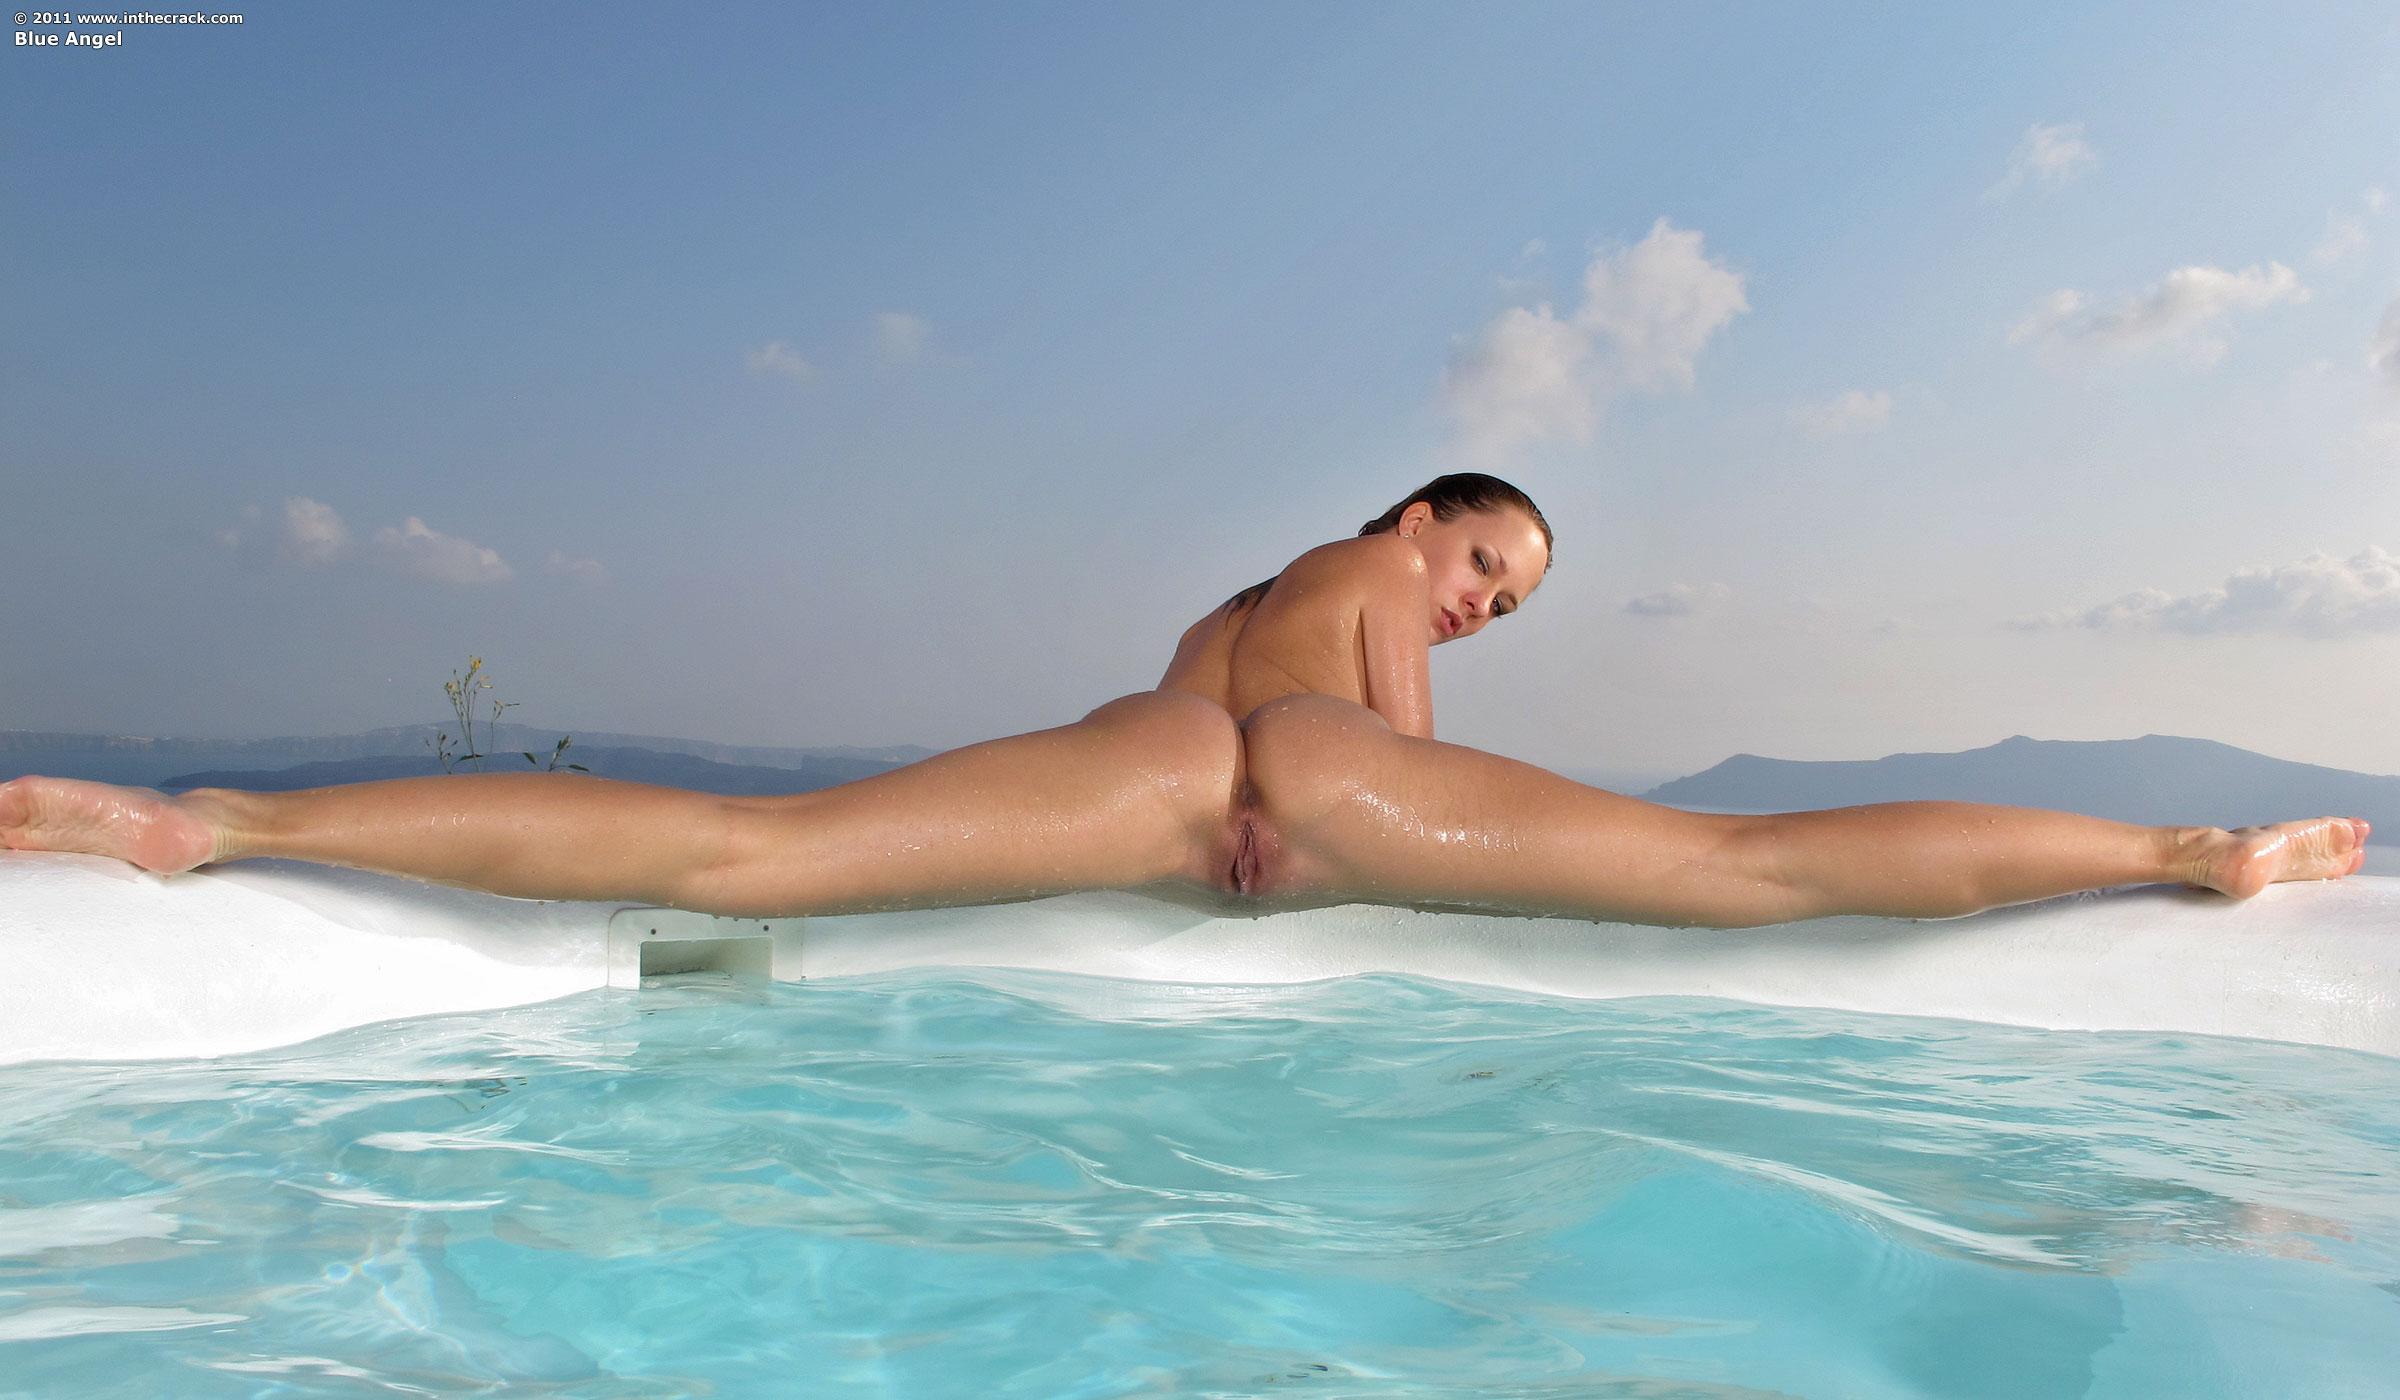 flexible-nude-girls-gymnast-splits-fetish-mix-vol2-07